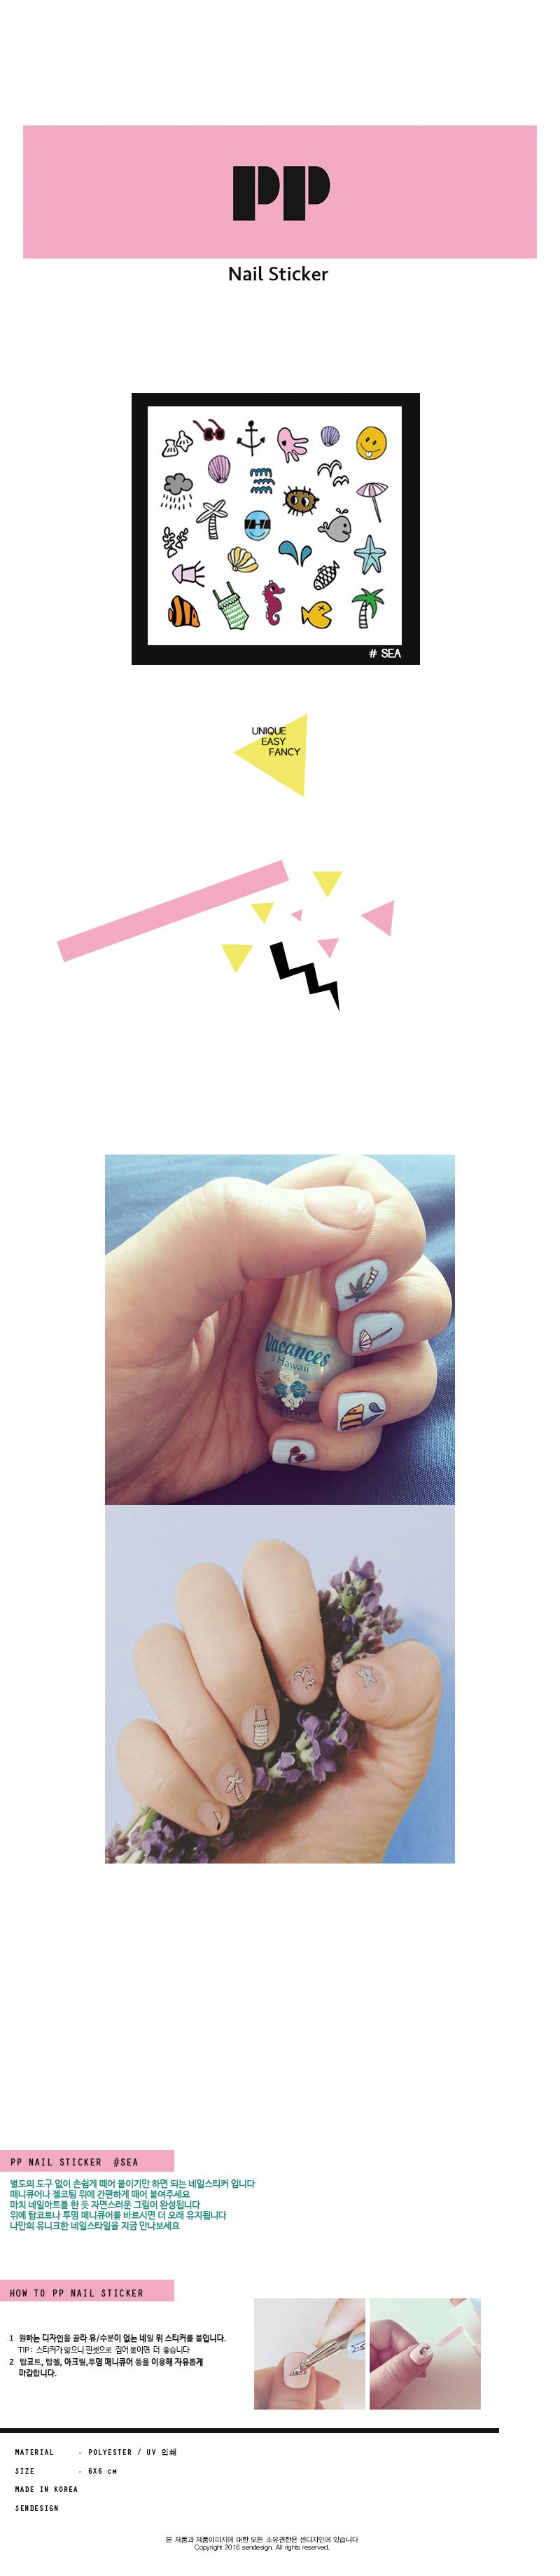 pp nail sticker - sea - 센디자인, 3,500원, 네일, 네일스티커/파츠